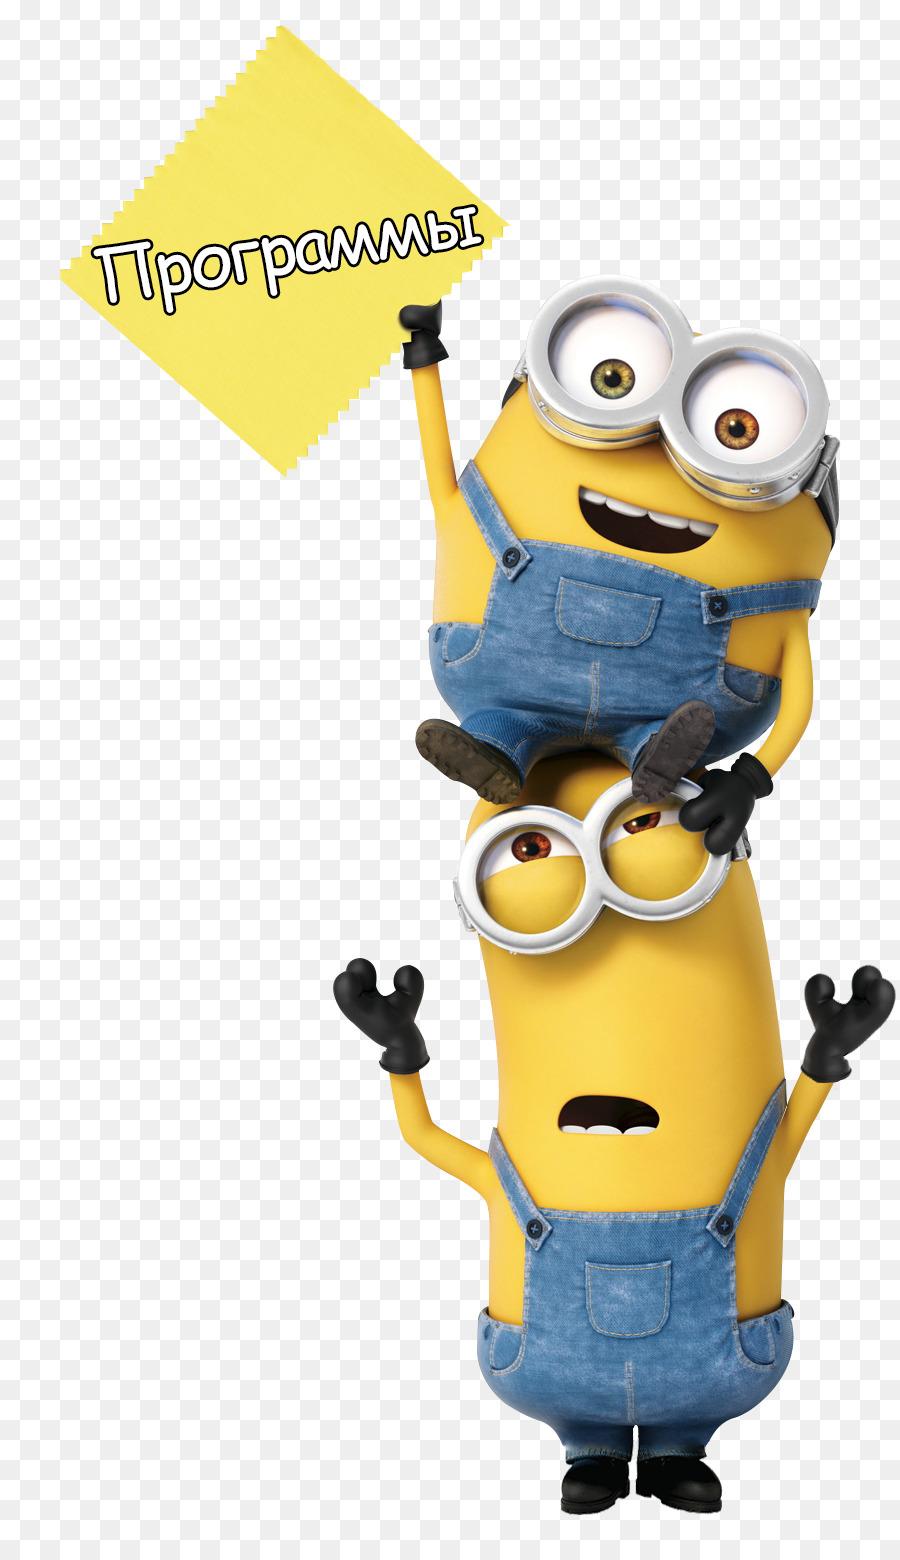 Bob The Minion Minions Kevin The Minion Stuart The Minion Minions